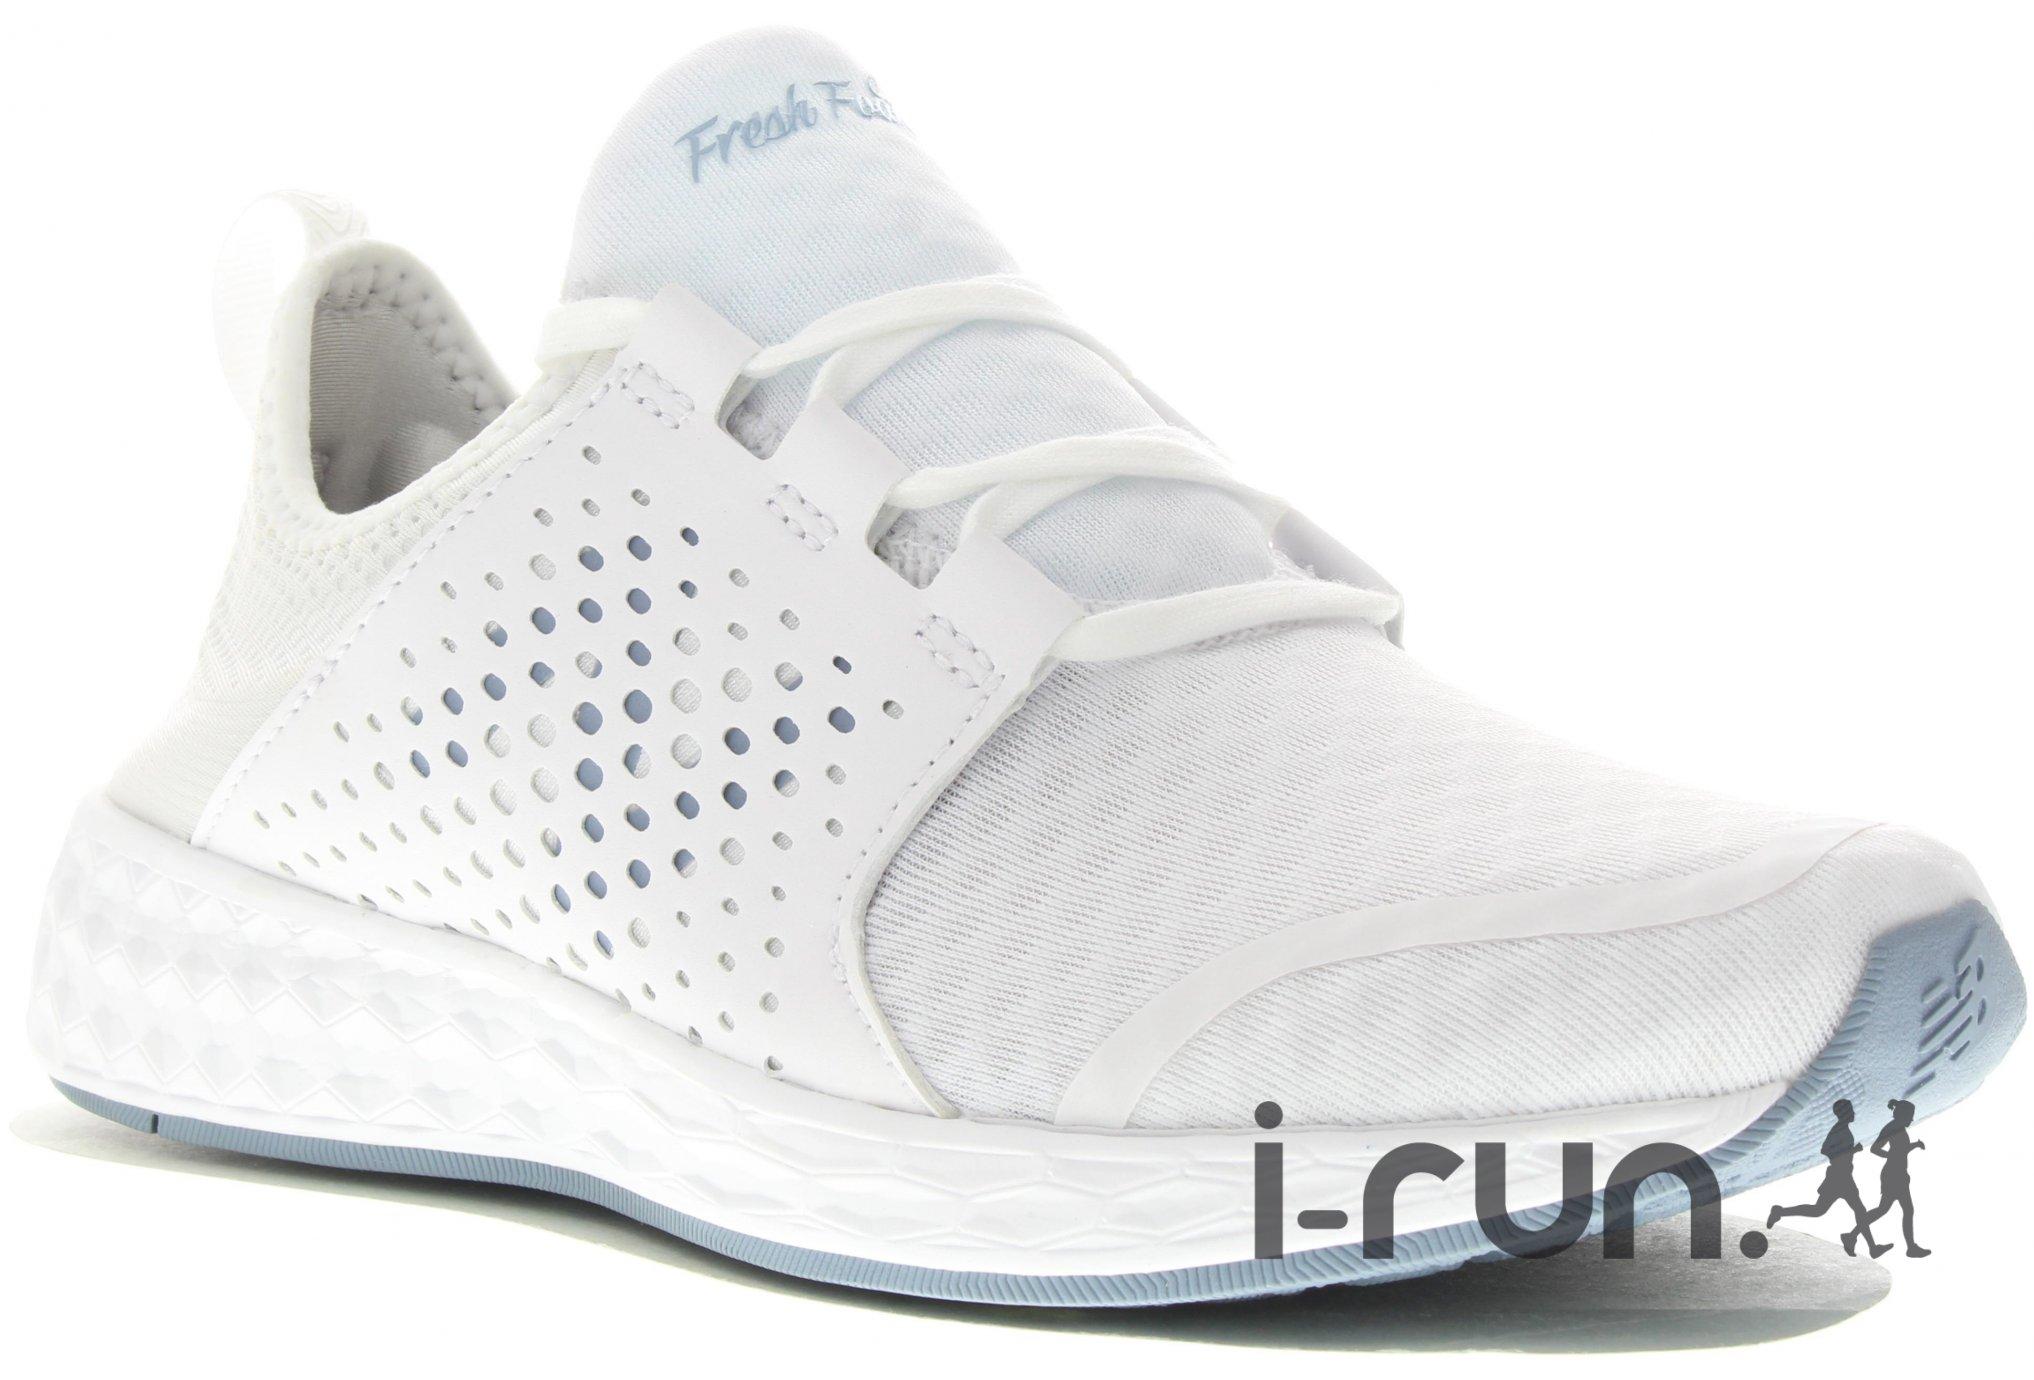 New Balance Fresh Foam Cruz W Chaussures running femme